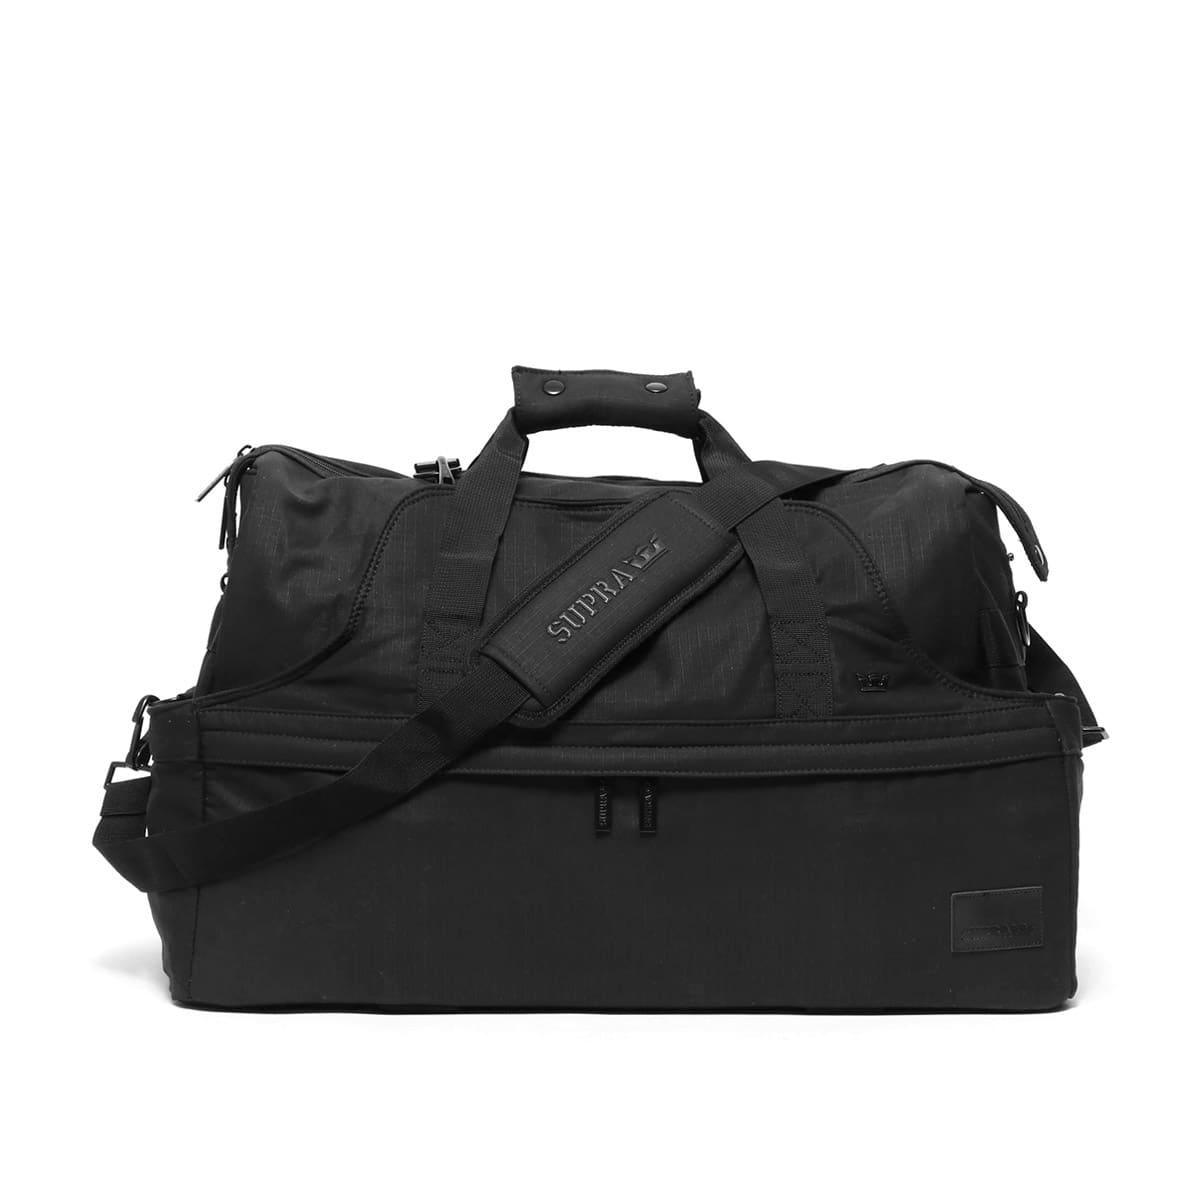 SUPRA TWO-IN-ONE DUFFLE BAG BLACK 14HO-I_photo_large